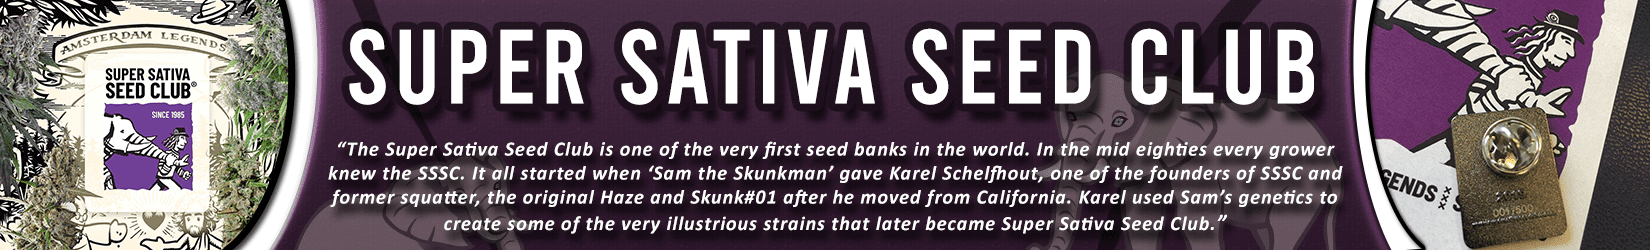 Cannabis Seeds Breeder - Super Sativa Seed Club